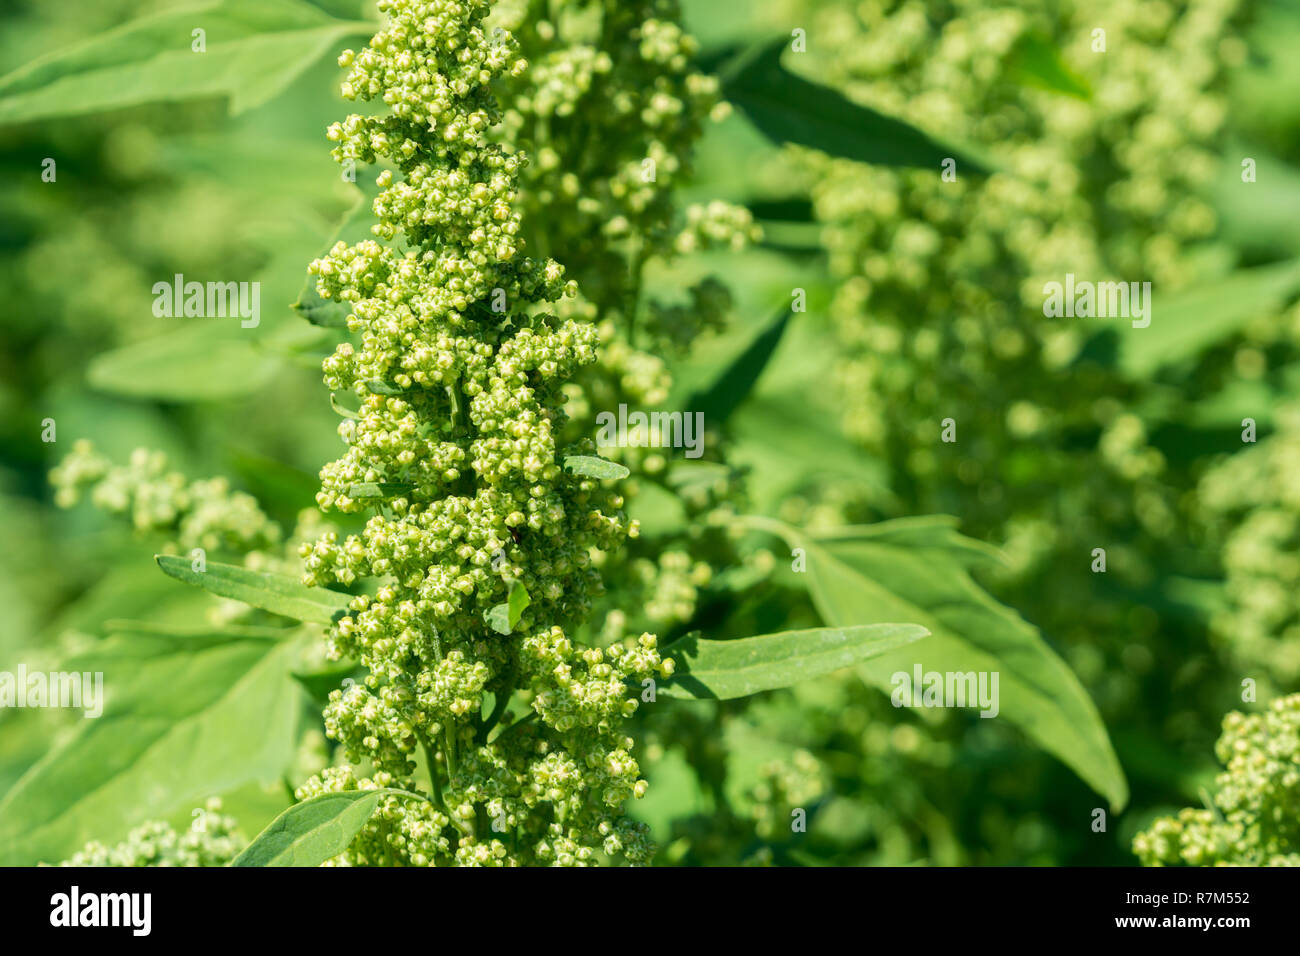 - Nahaufnahme grün Schisandra Album Pflanzen. Stockbild